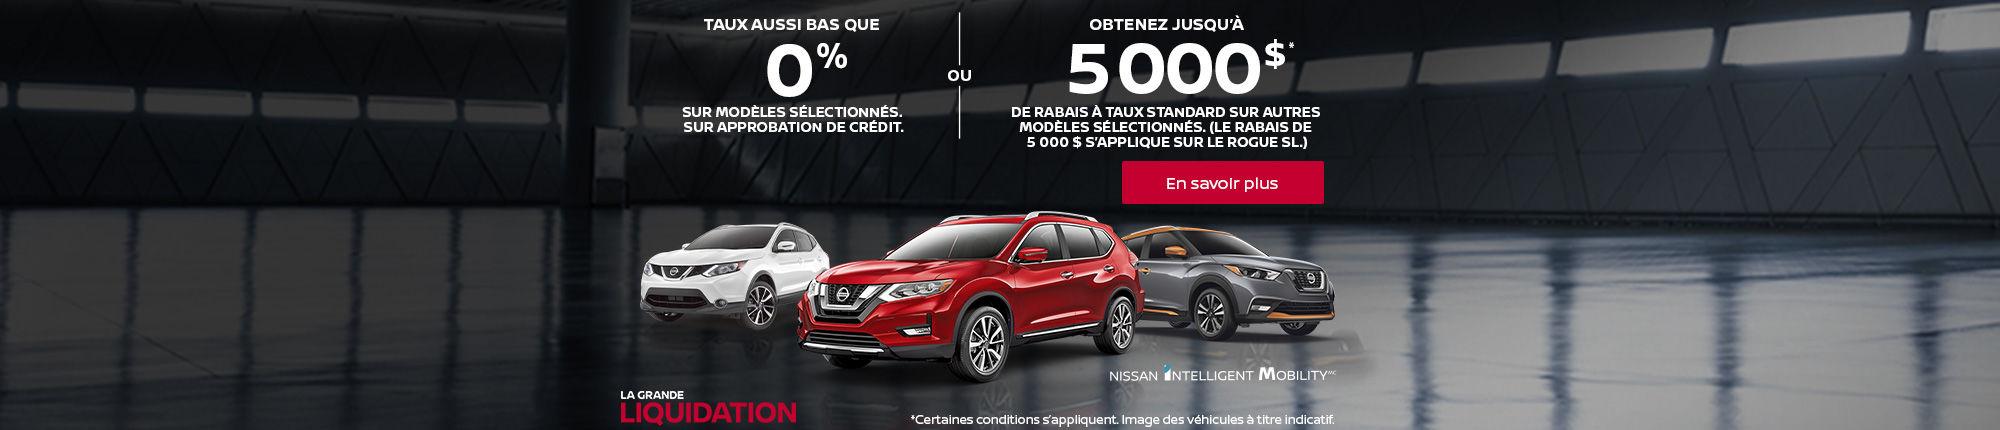 Vente liquidation Nissan